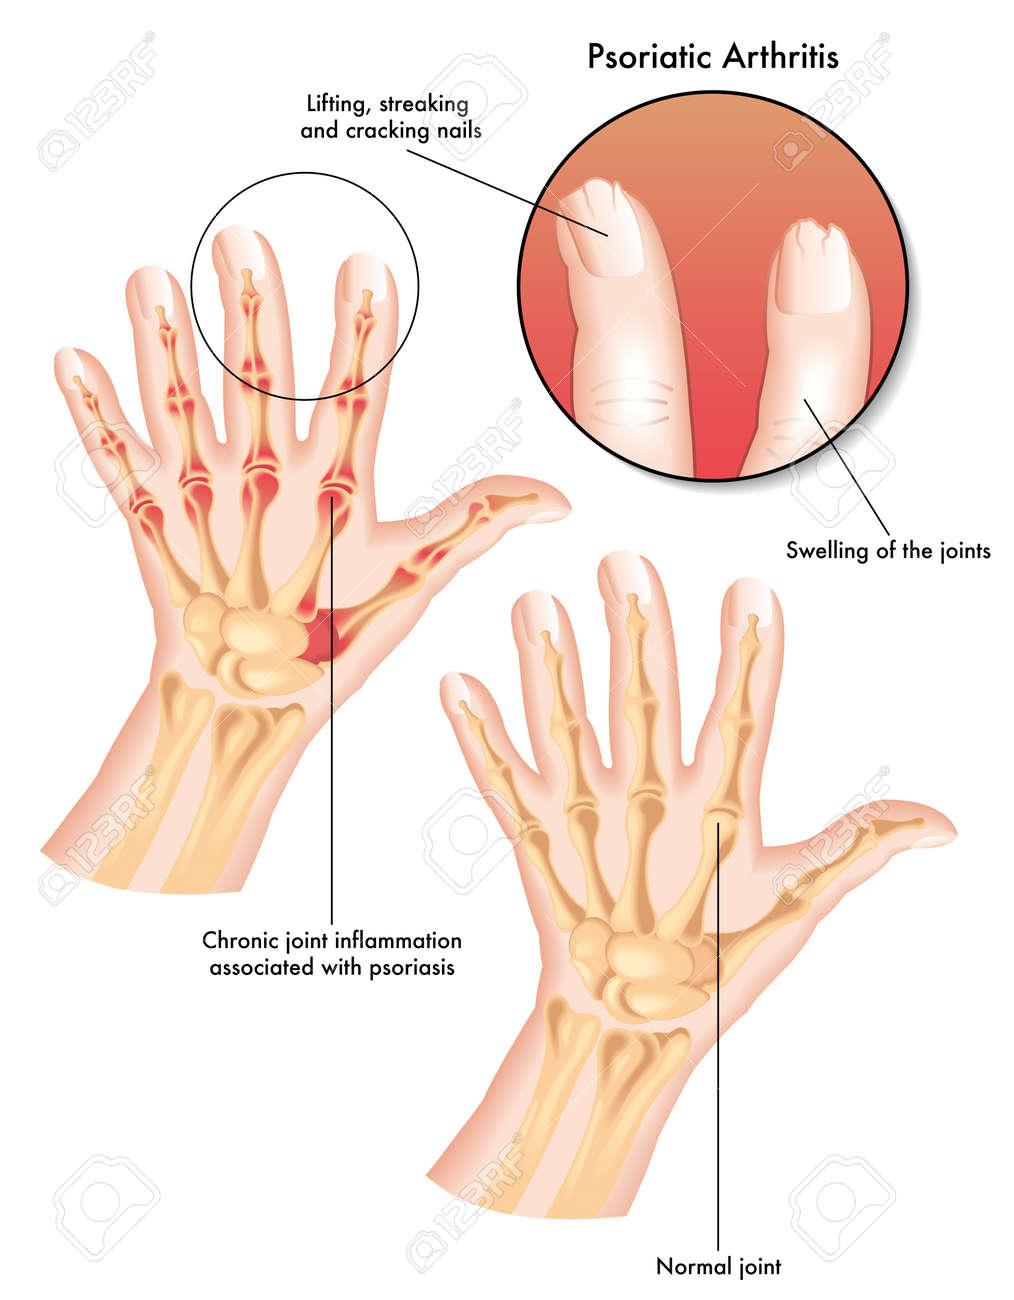 arthritis psoriatica en espanol)